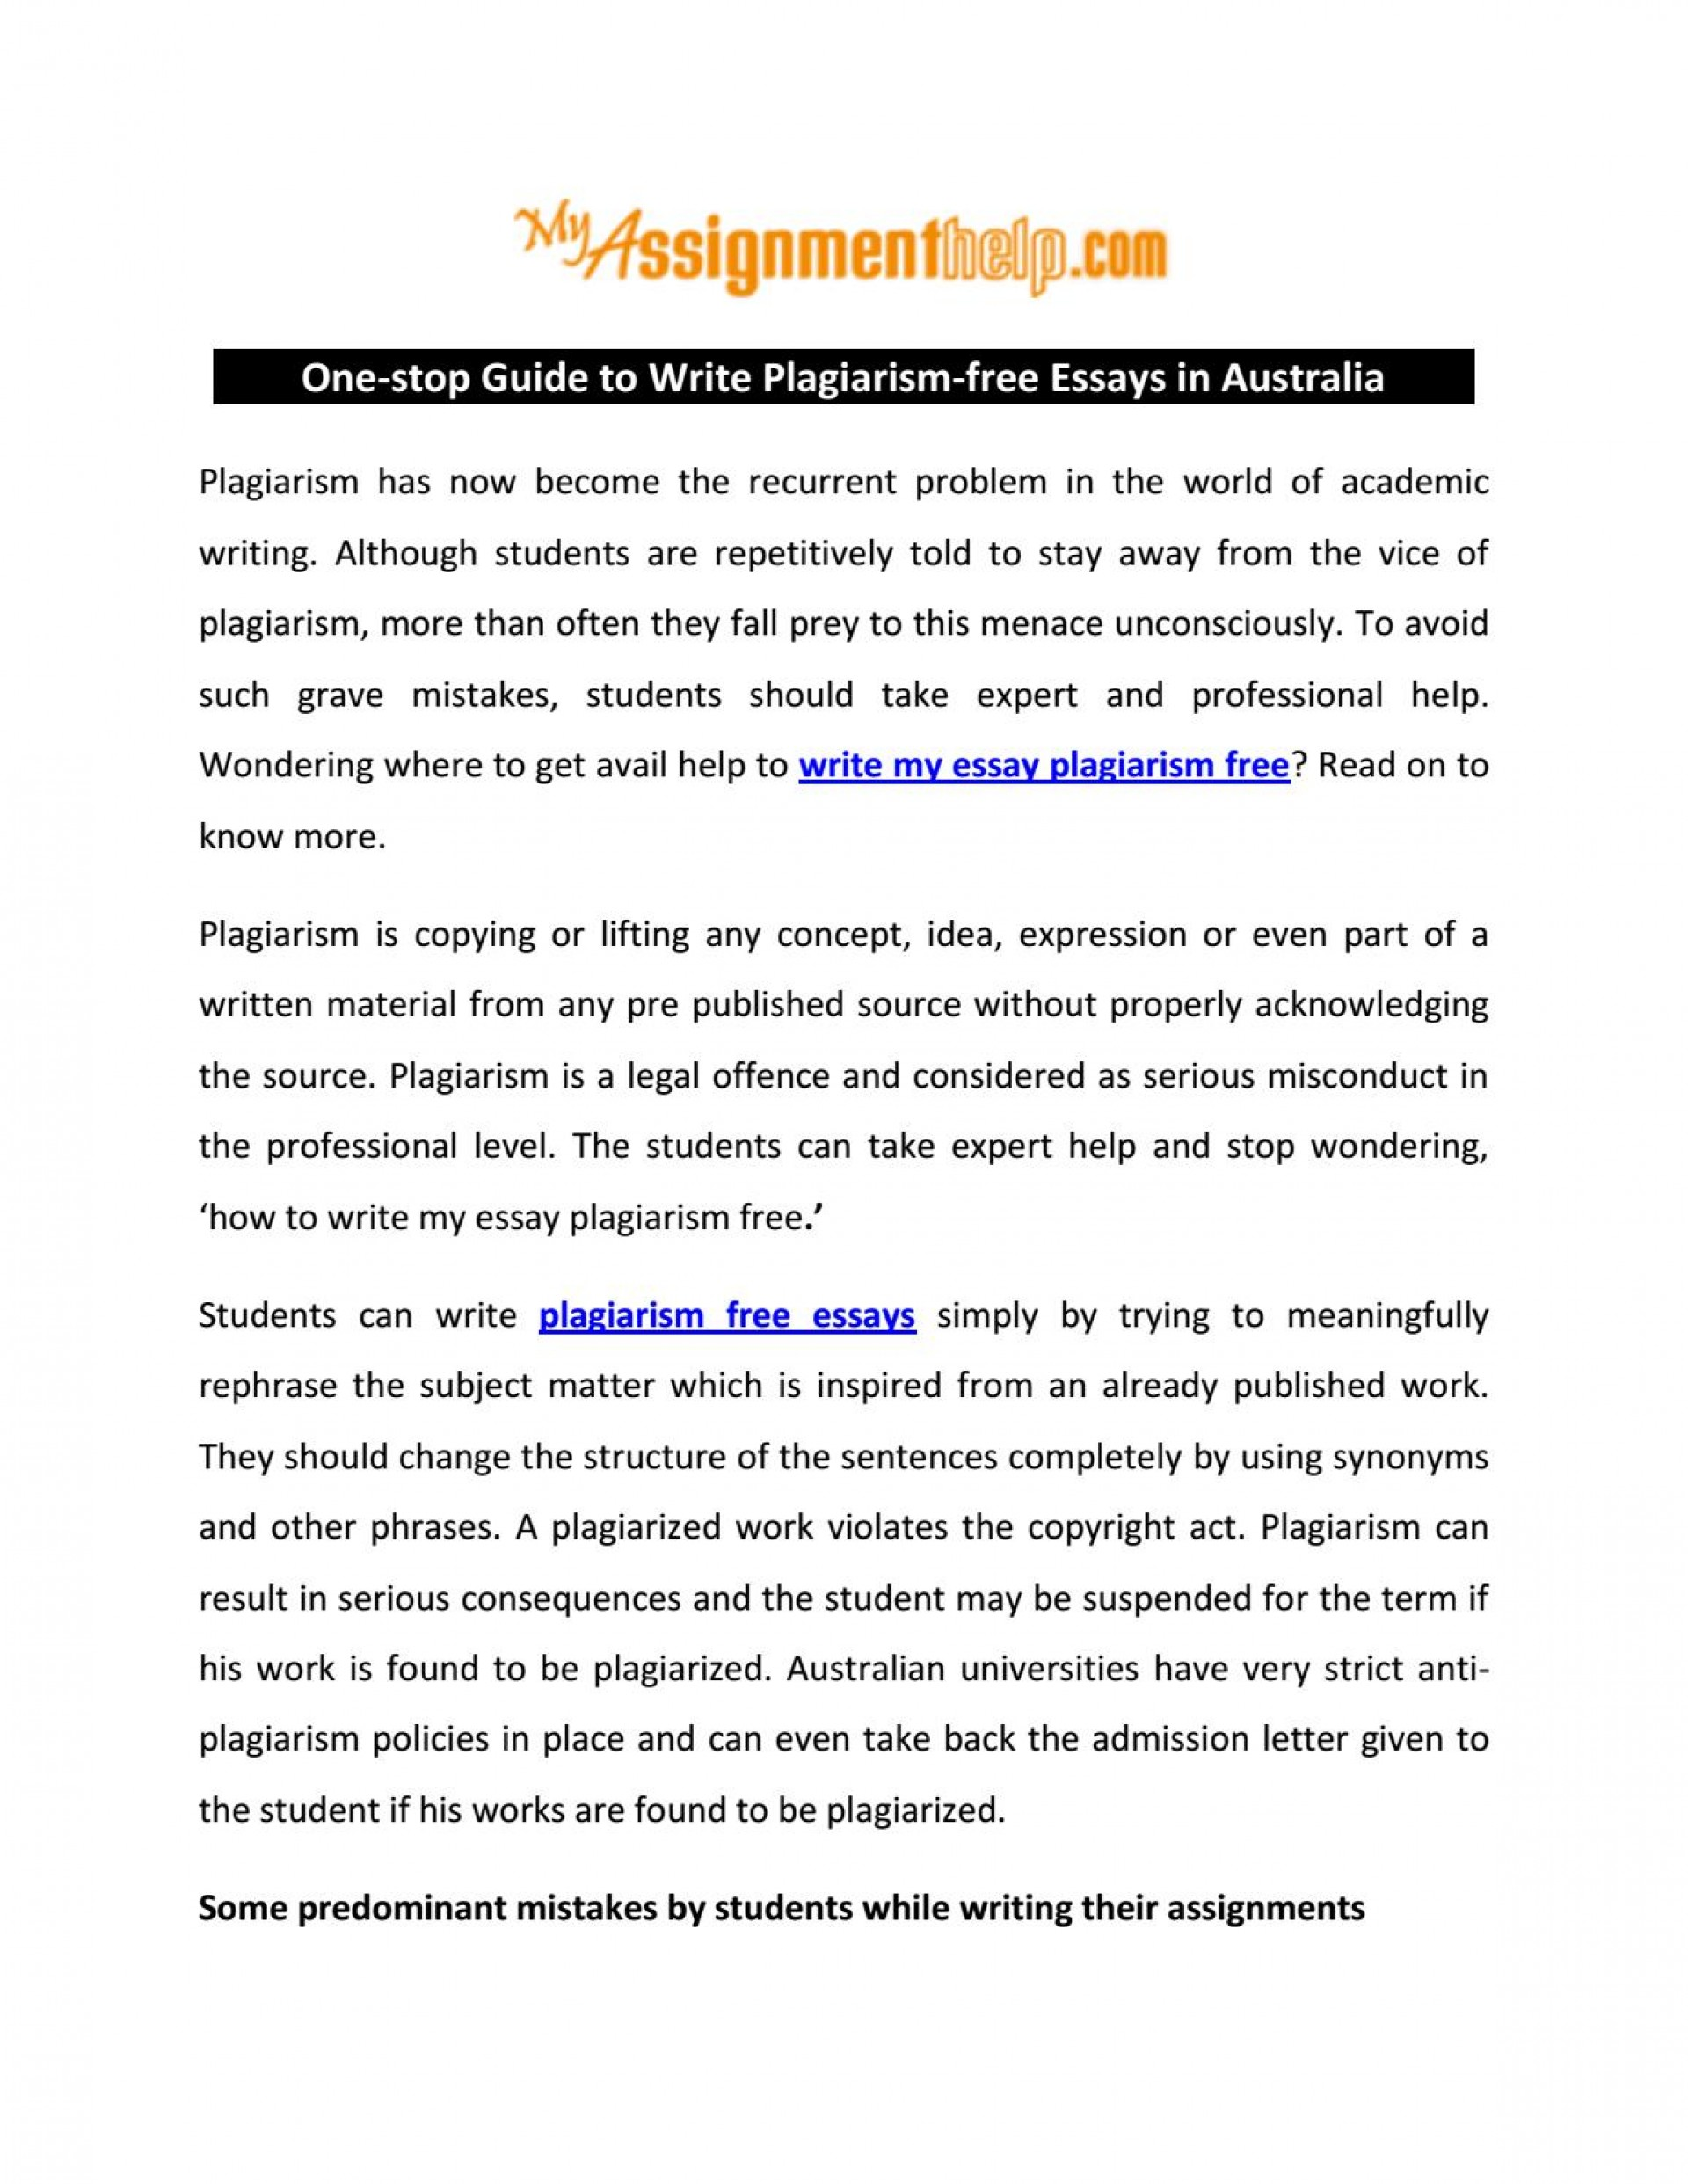 007 Essay Example Plagiarism Free Essays Page 1 Impressive 100 Check 1920